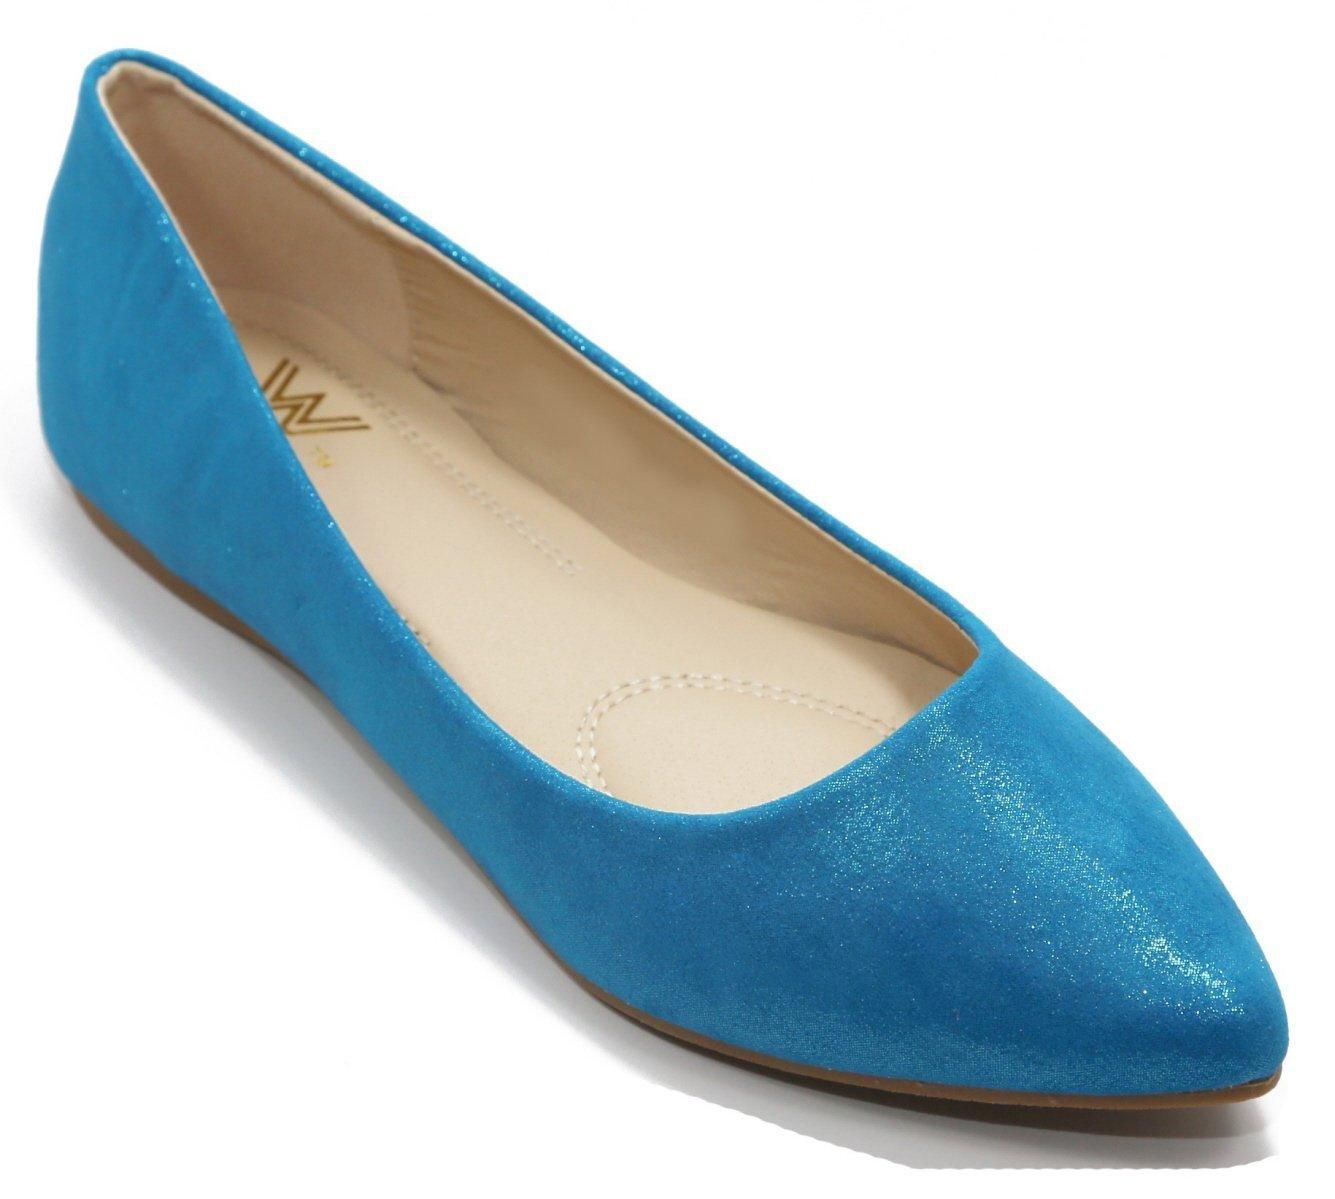 Walstar Women's Basic Point Toe Ballet Flats B00U6KBUDU 8 B(M) US Ms518-blue